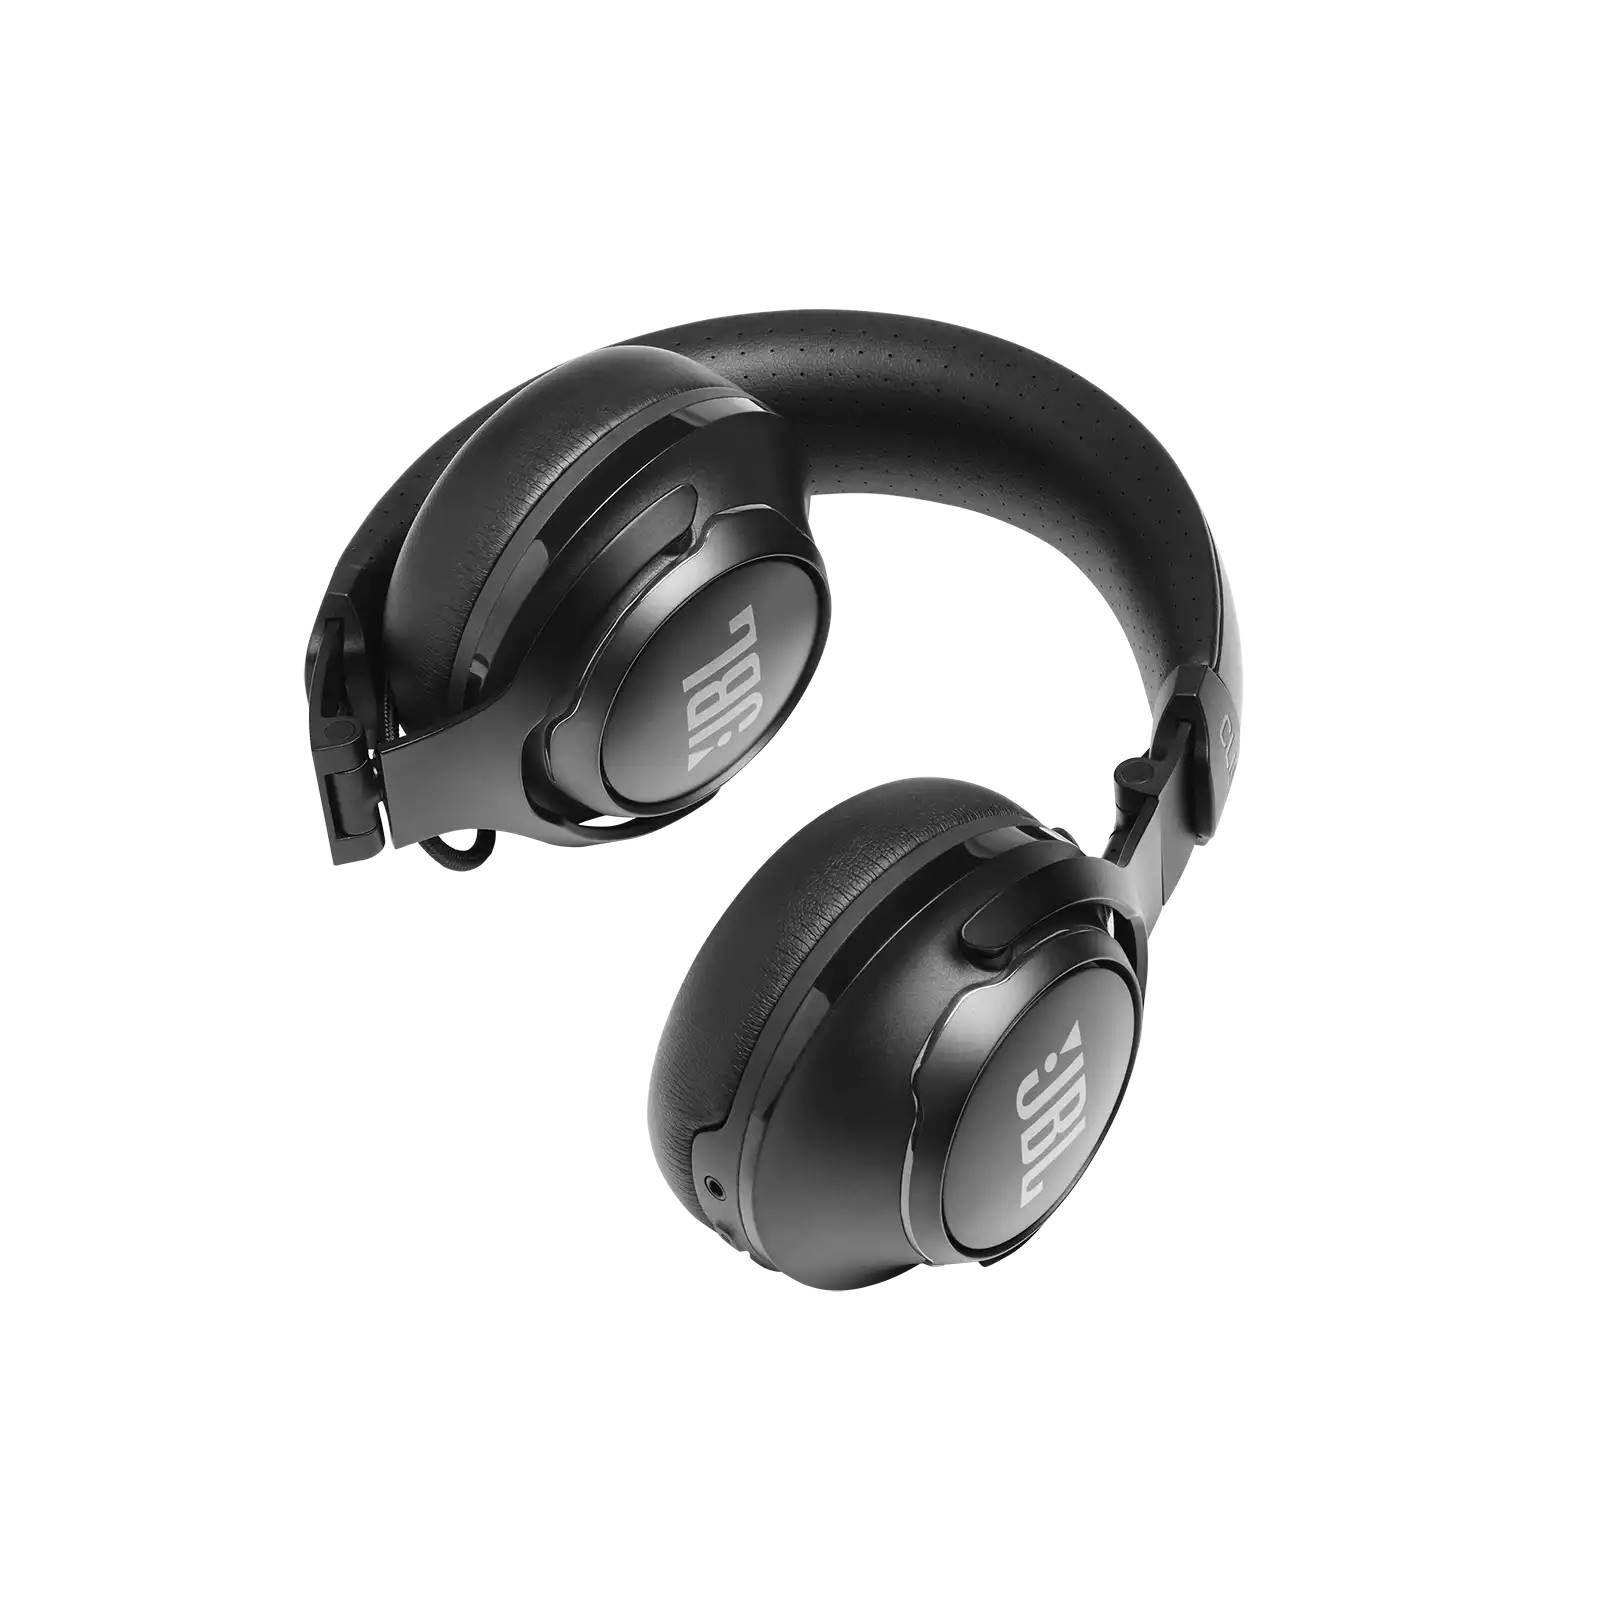 Fone de Ouvido Bluetooth JBL Club 700BT - Preto JBLCLUB700BTBLK